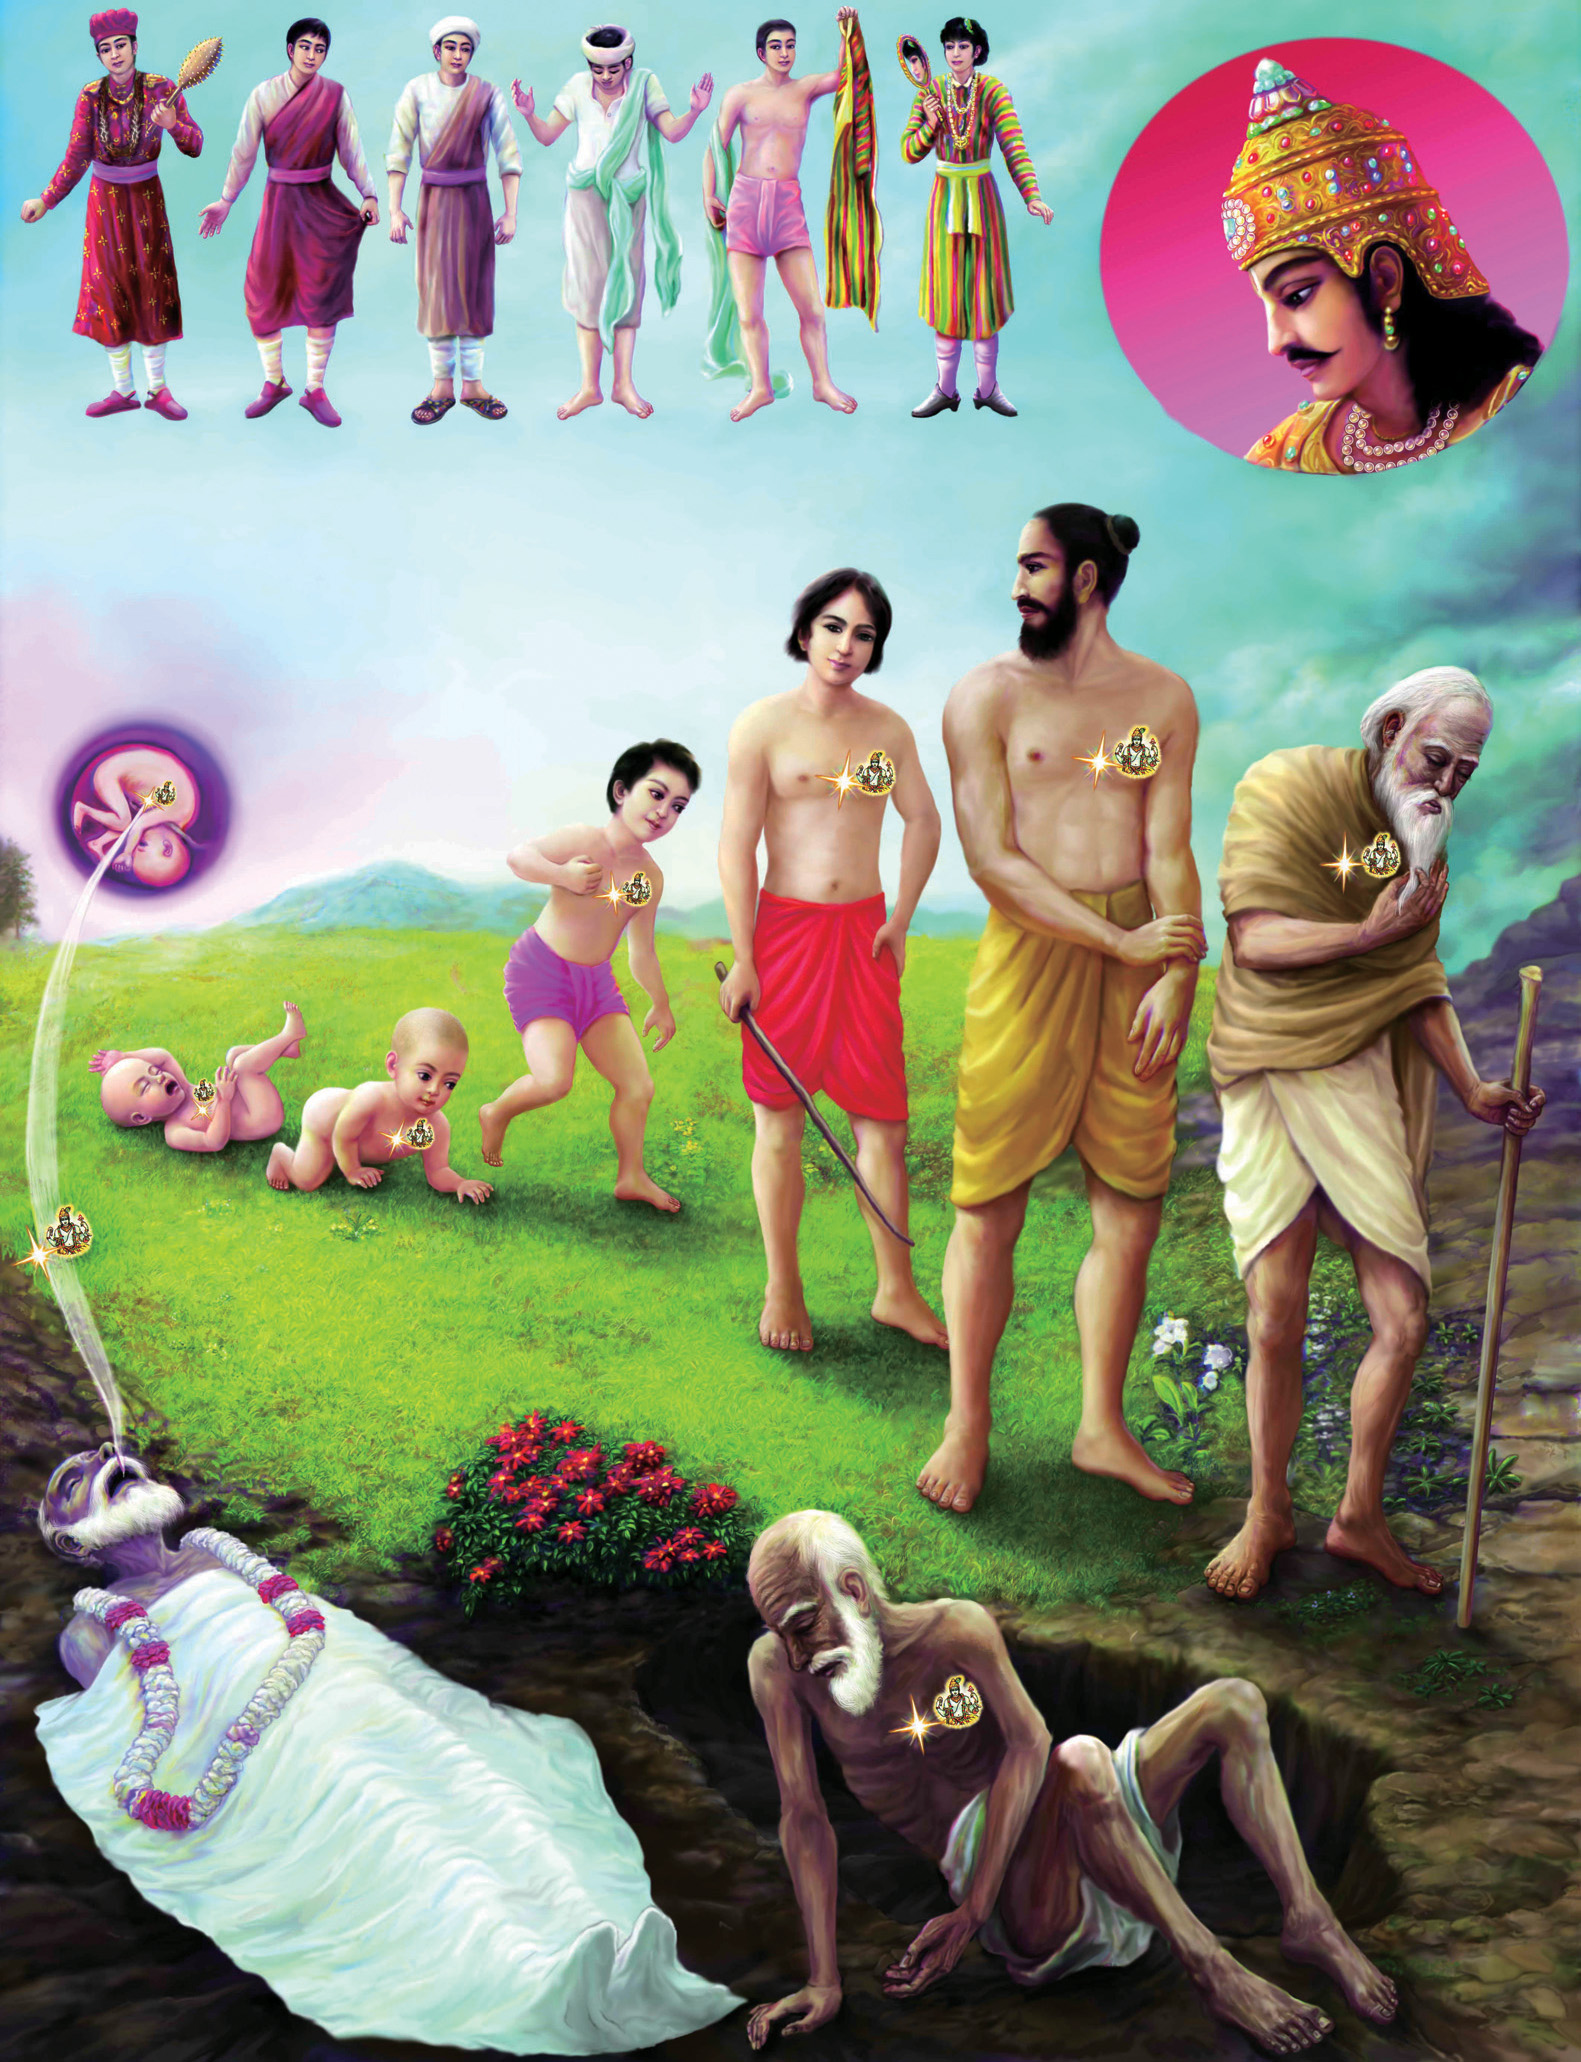 Bhagavad Gita Art Gallery--Plate 8: The soul changes bodies